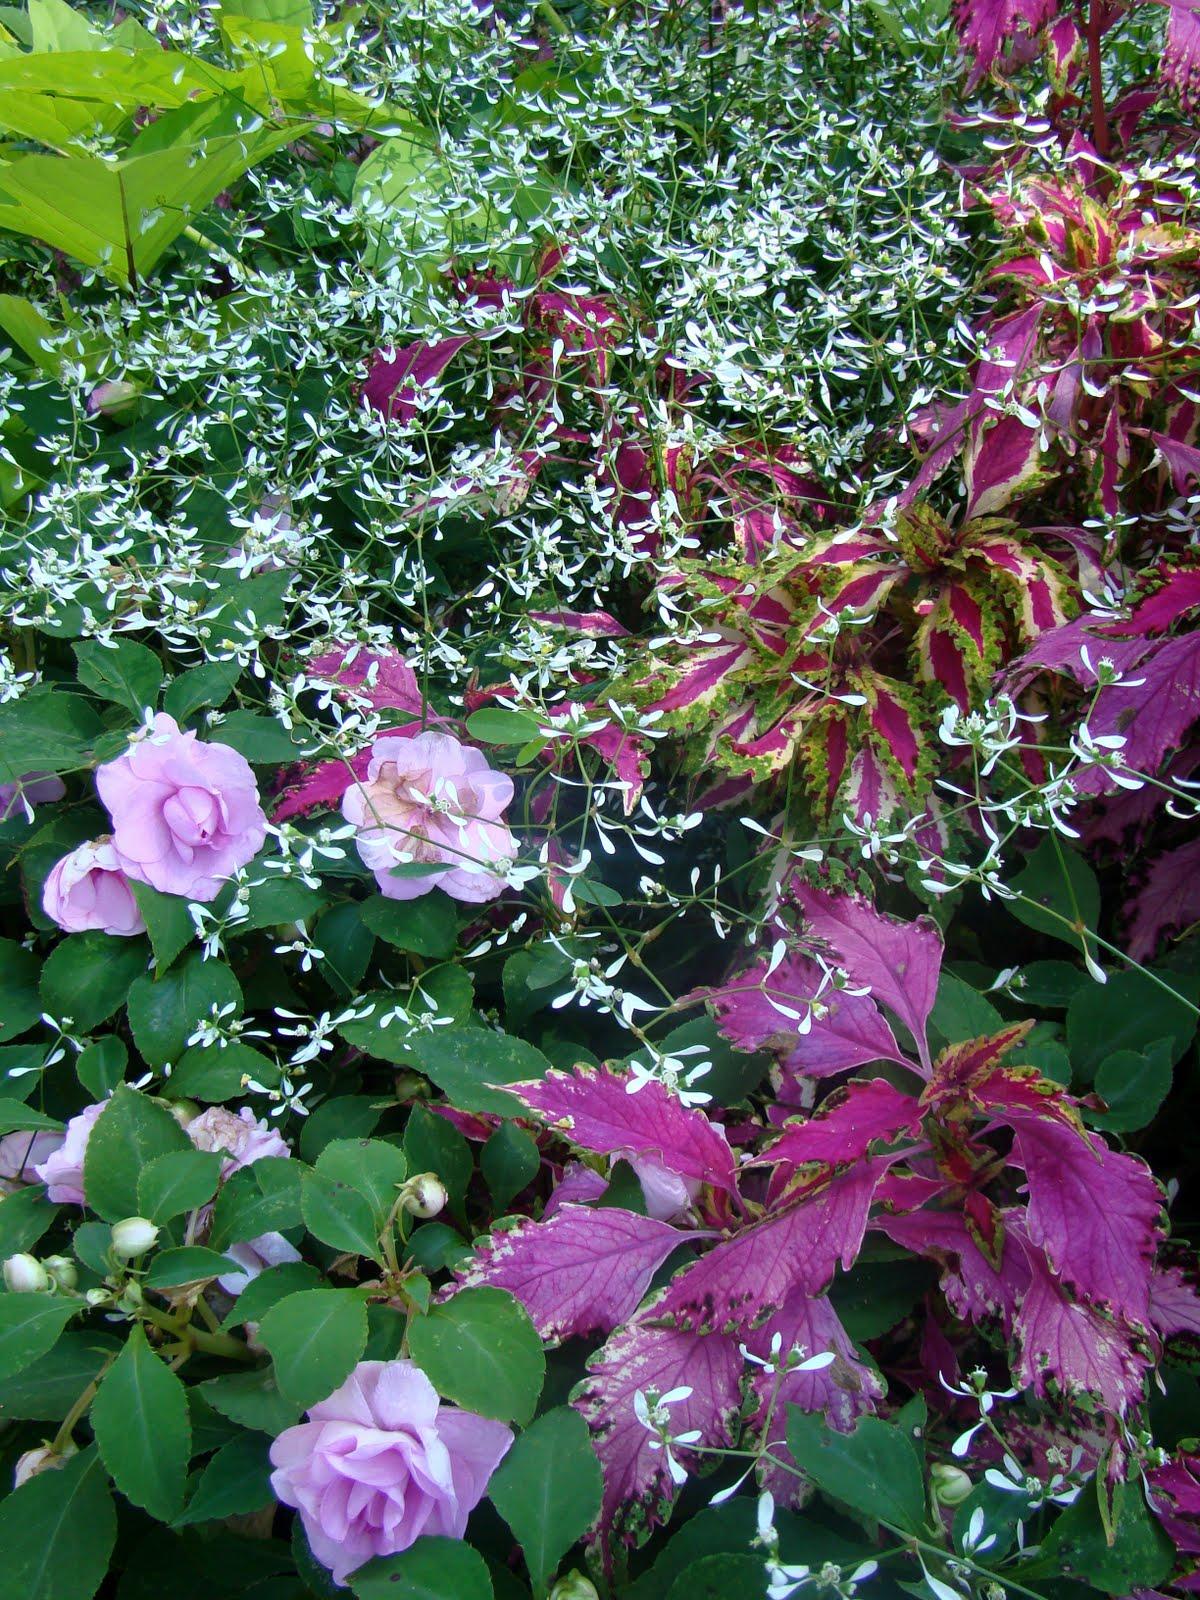 Pruning in the Late Summer Flower Garden - Prune Away! on